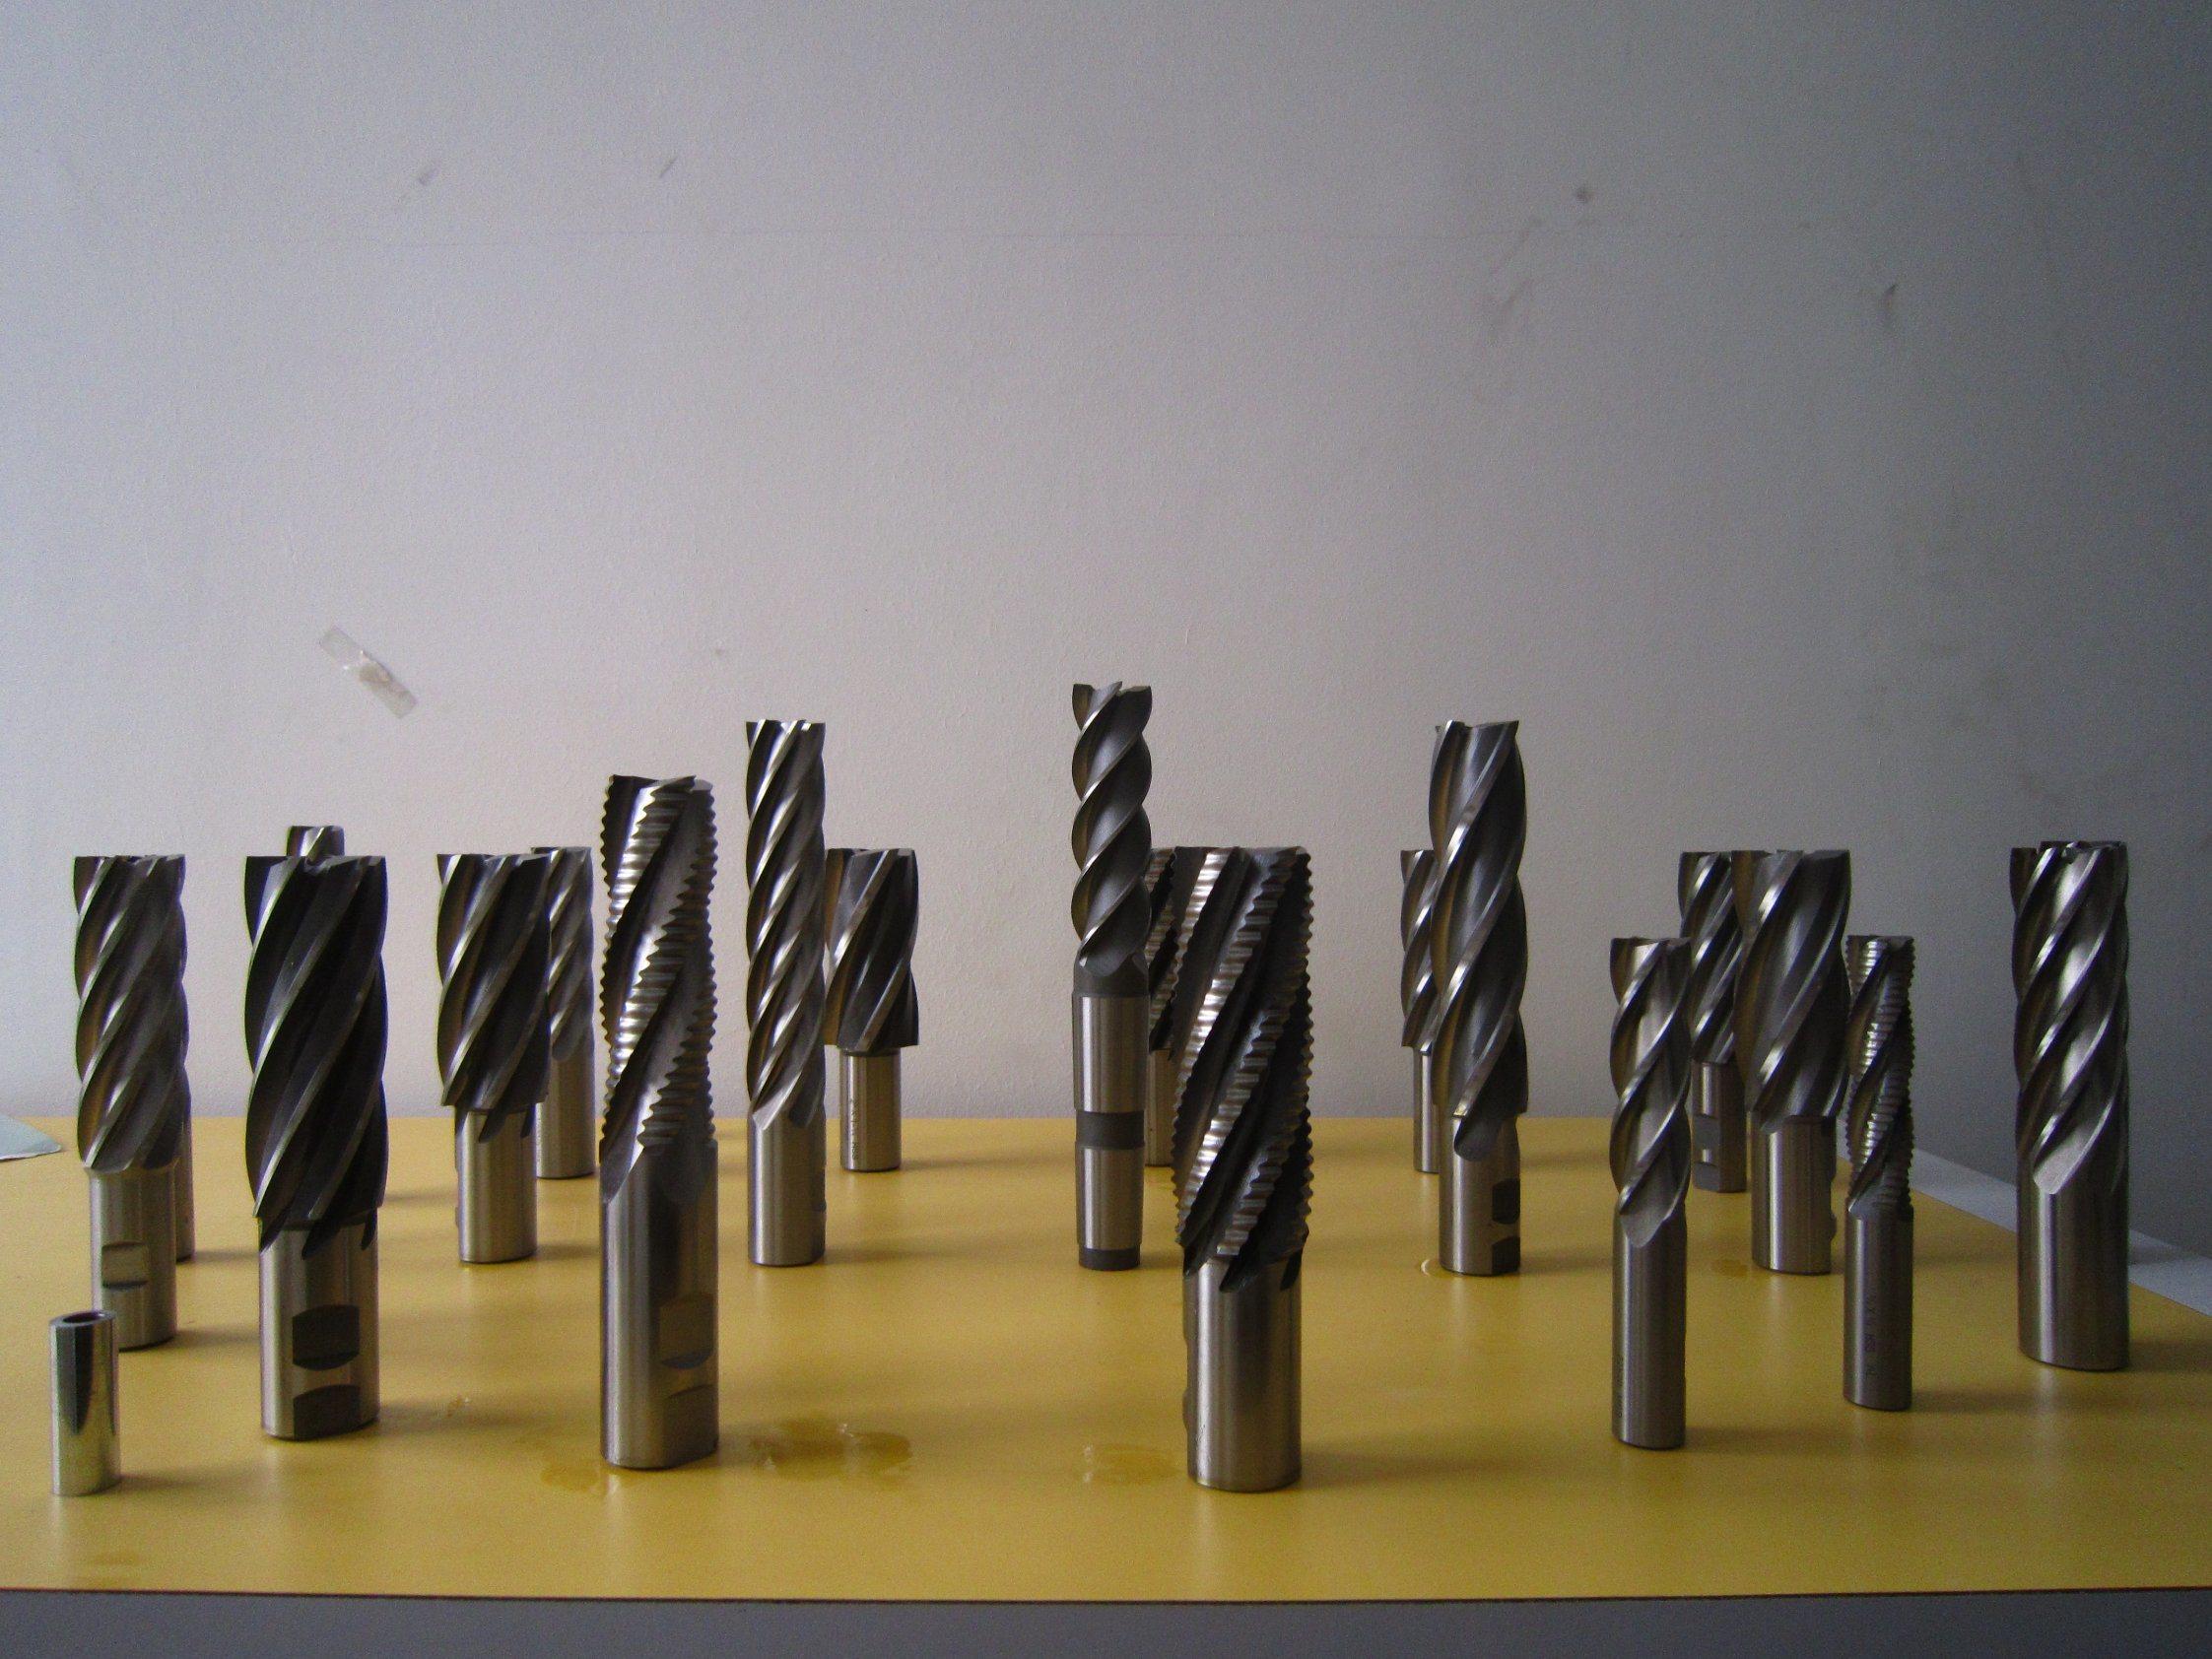 4 Flute Single End Mill